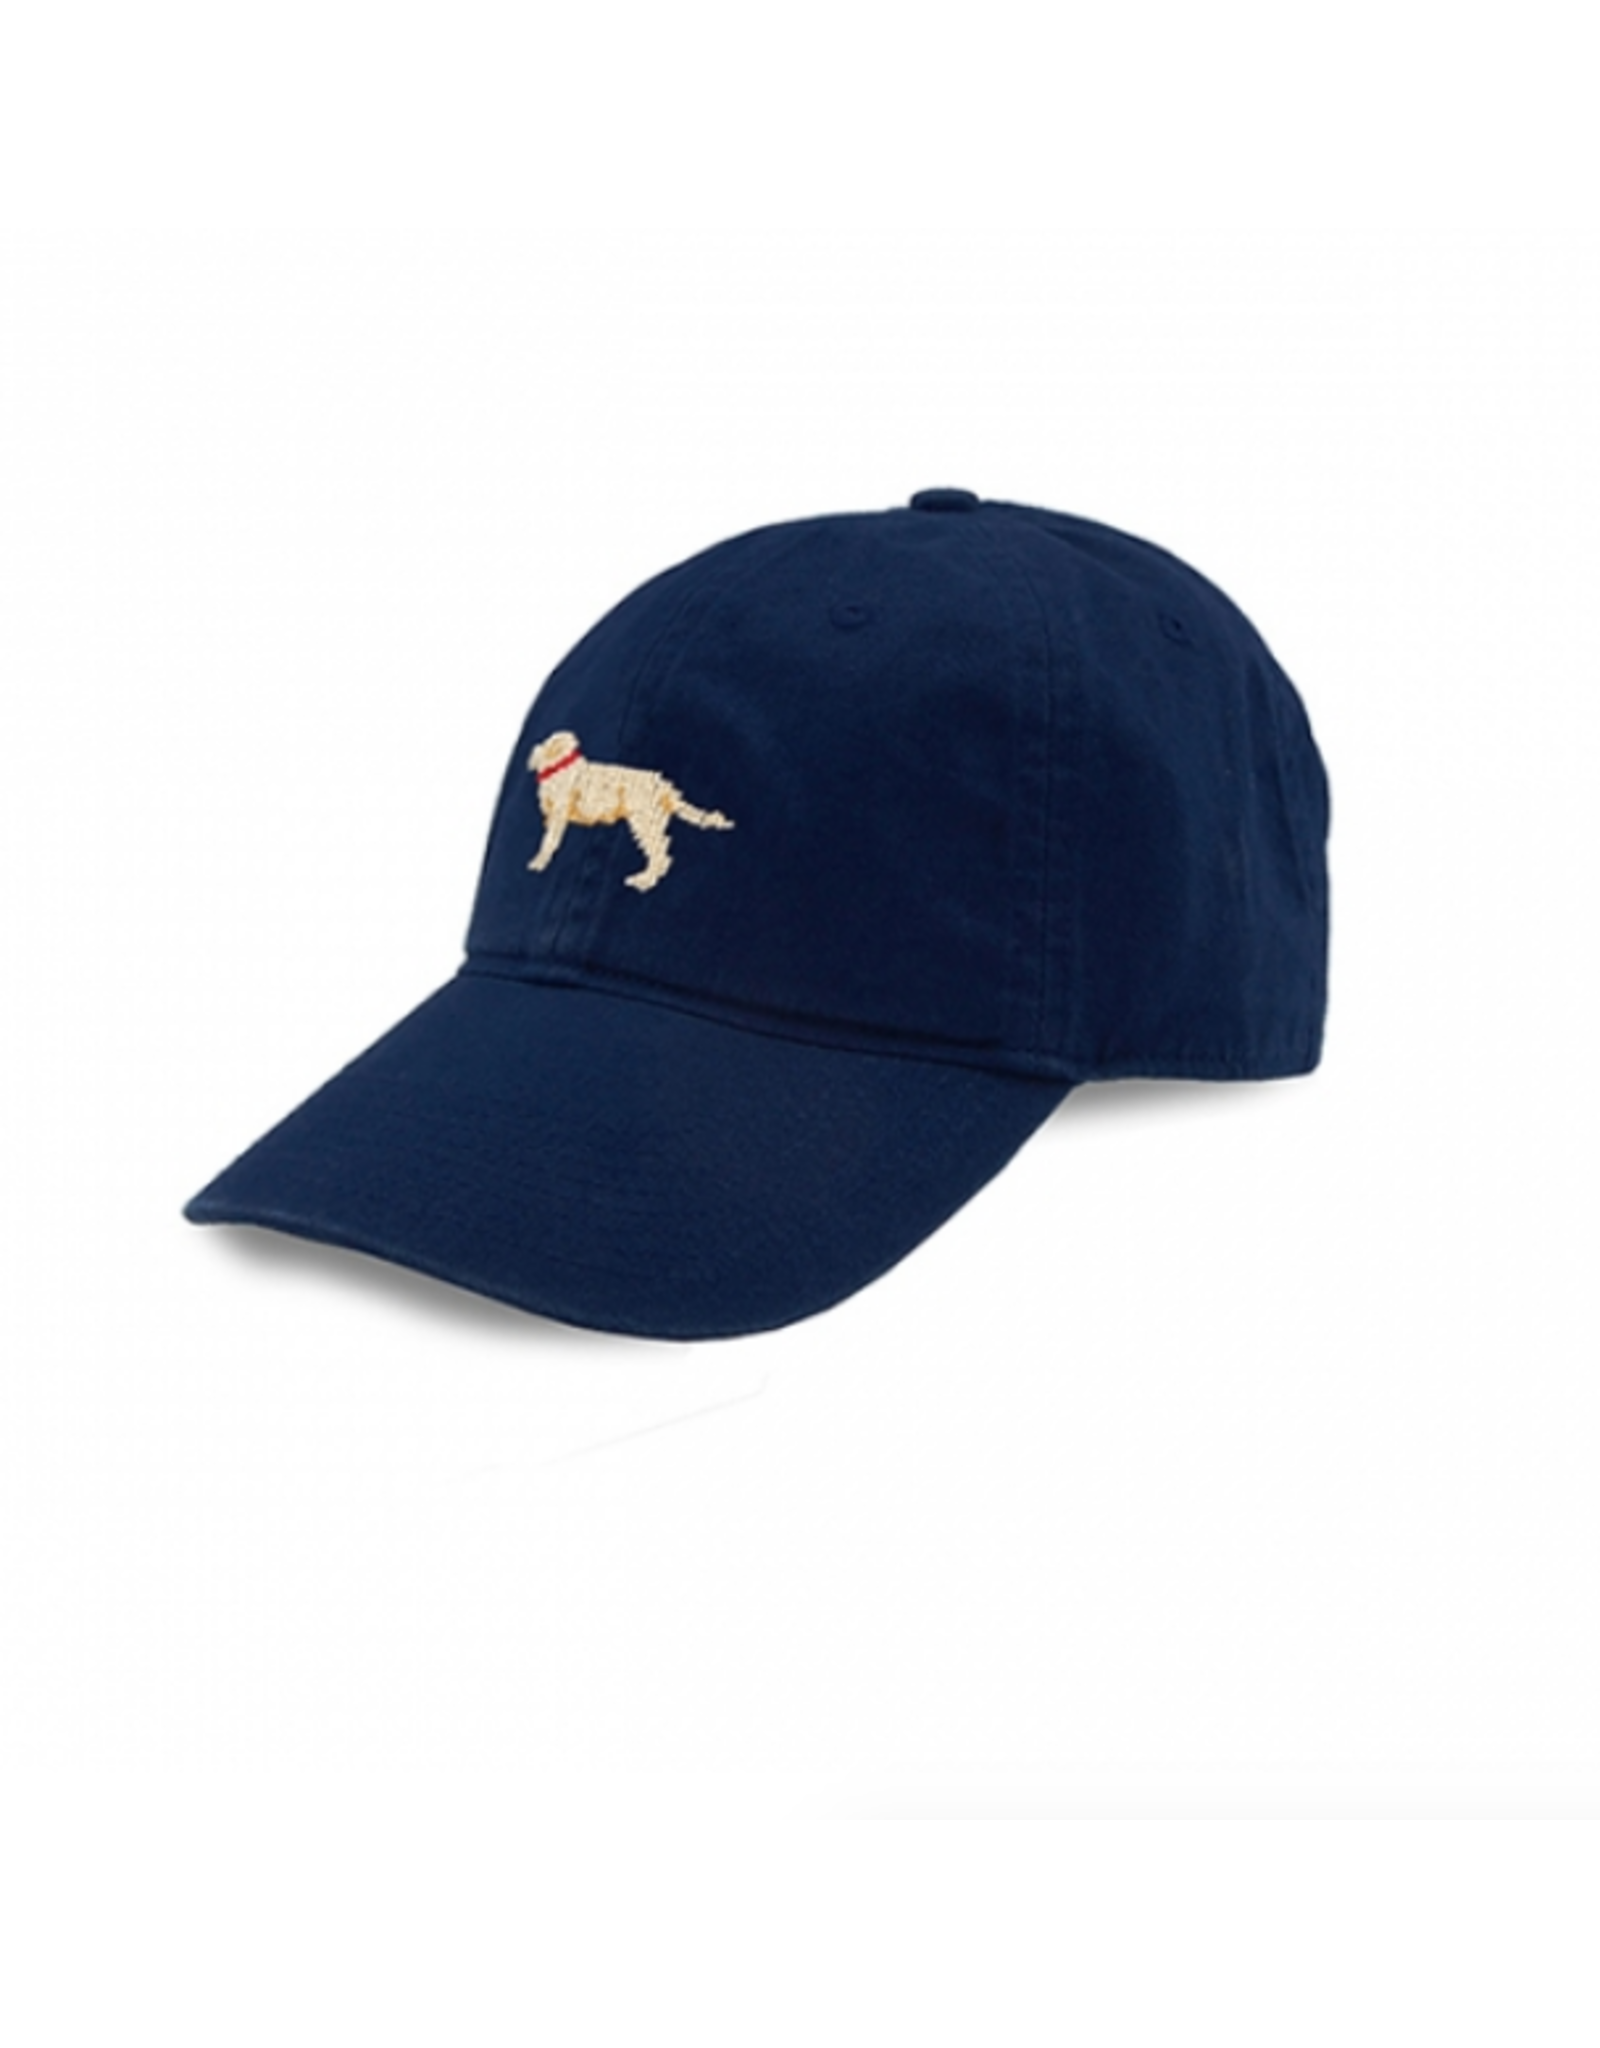 Smathers & Branson S&B Needlepoint Ball Hat, Yellow Lab on Navy